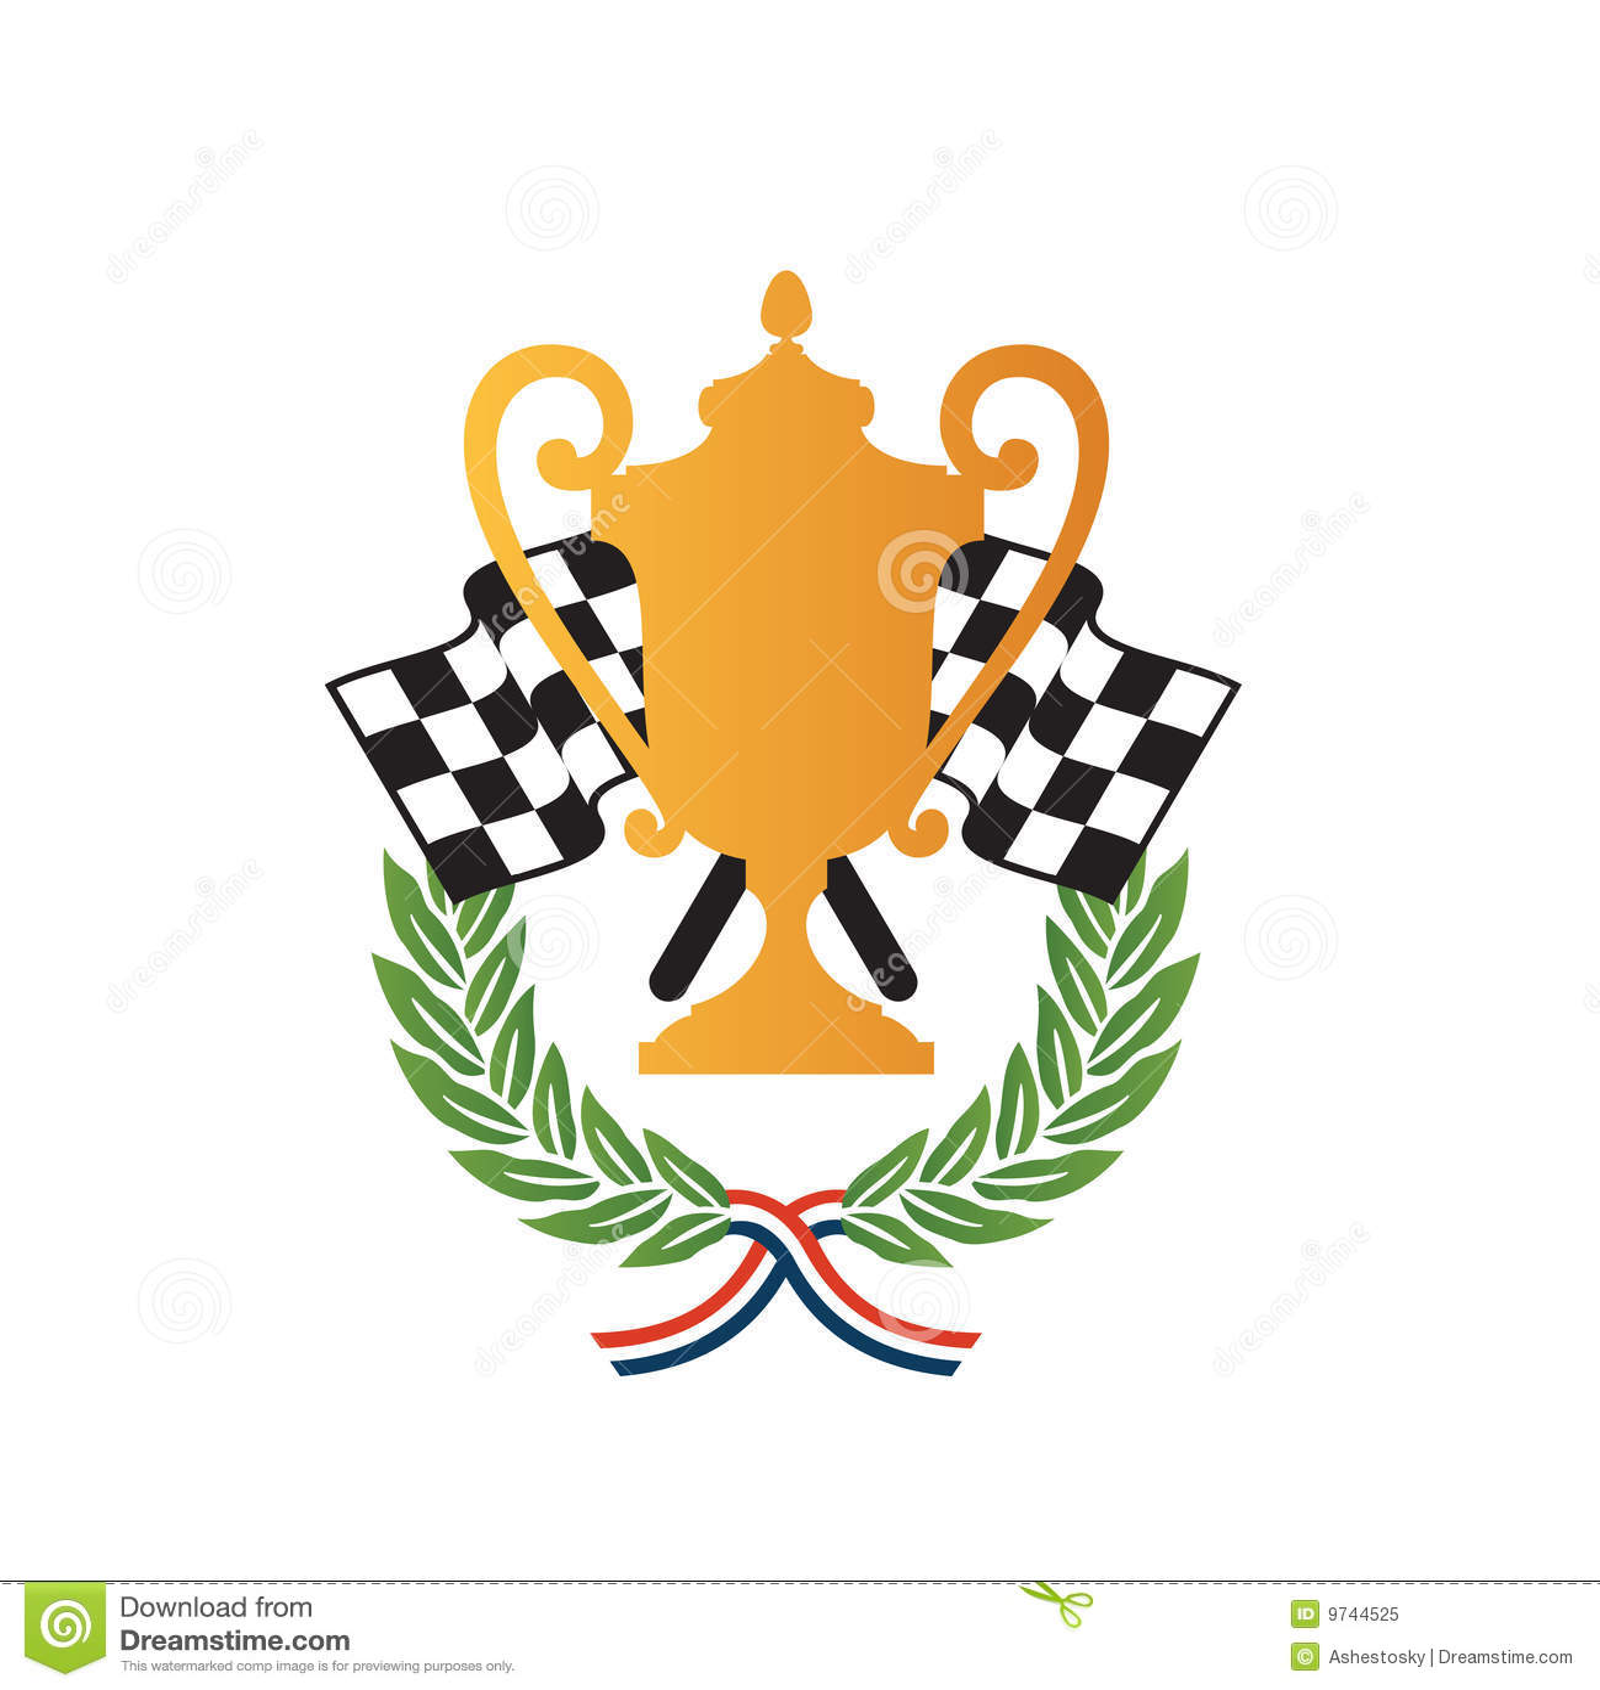 Car Race Winner Award Design Royalty Free Stock Photo - Image: 9744525